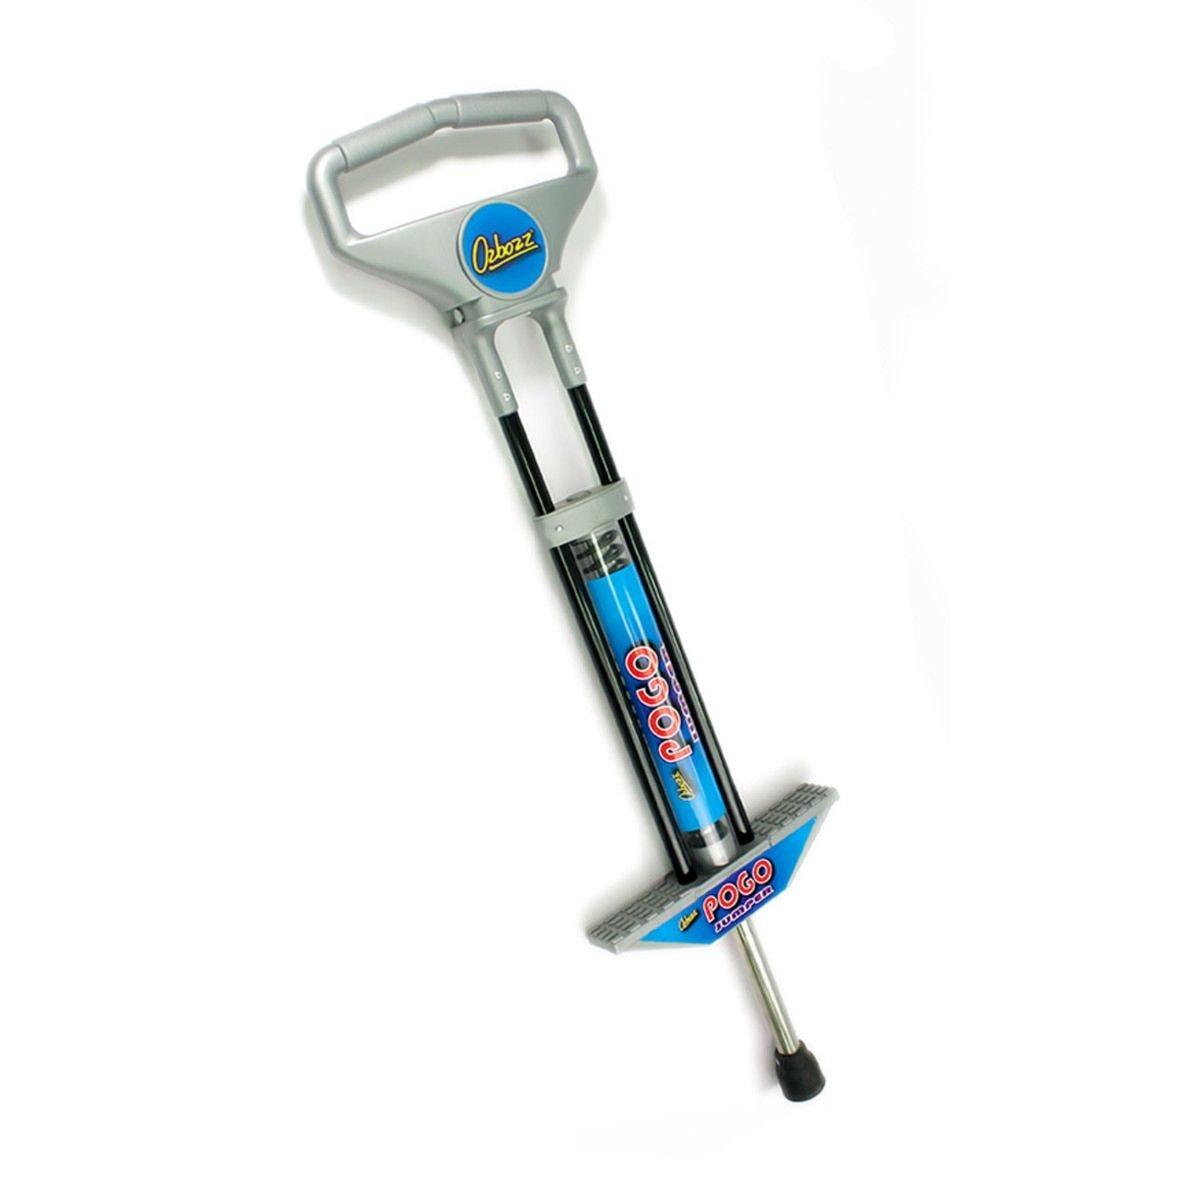 Ozbozz Pogo Stick 100cm Black and Silver